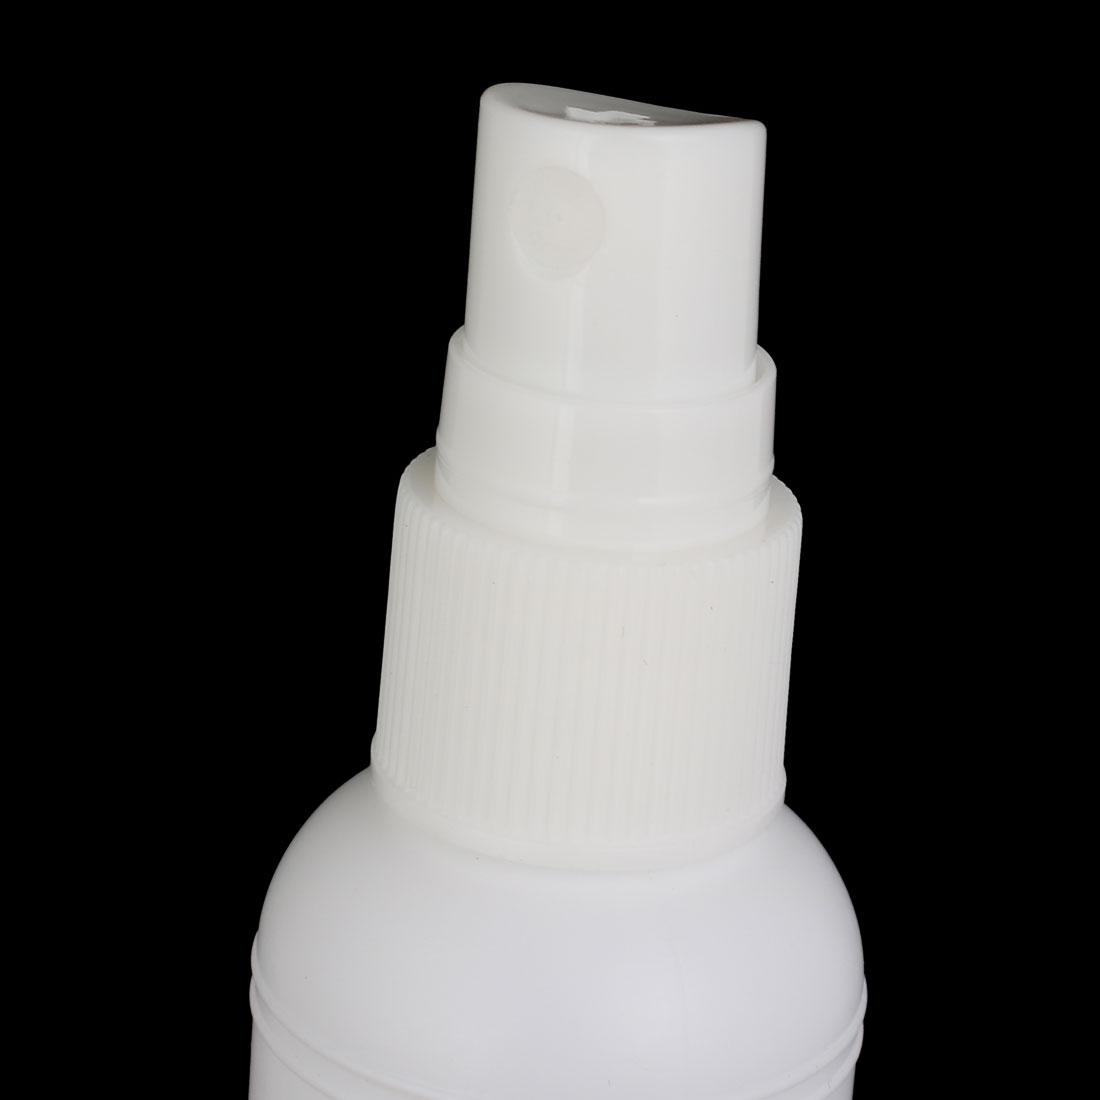 50ml PE Plastic Cylinder Shape DIY Water Spray Bottle White 2pcs - image 2 of 4